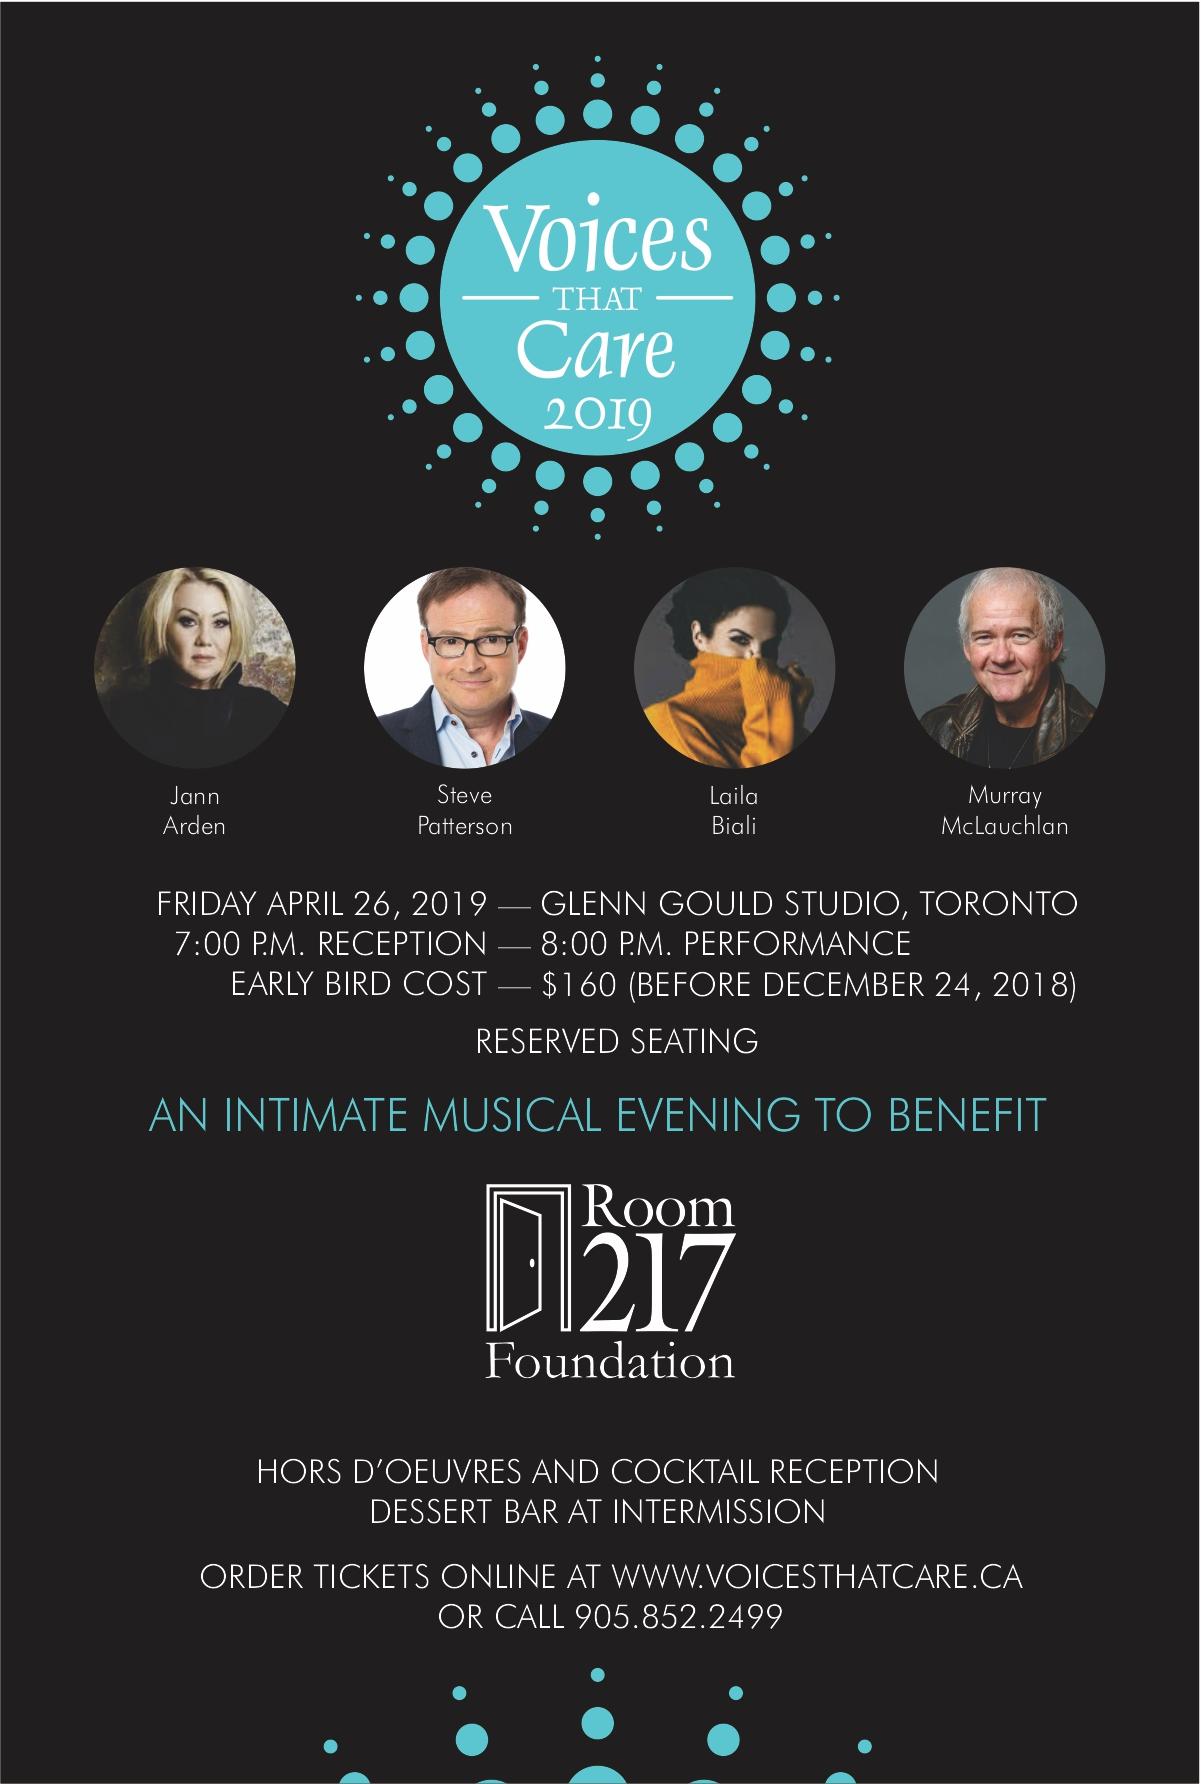 Voices that Care concert invitation